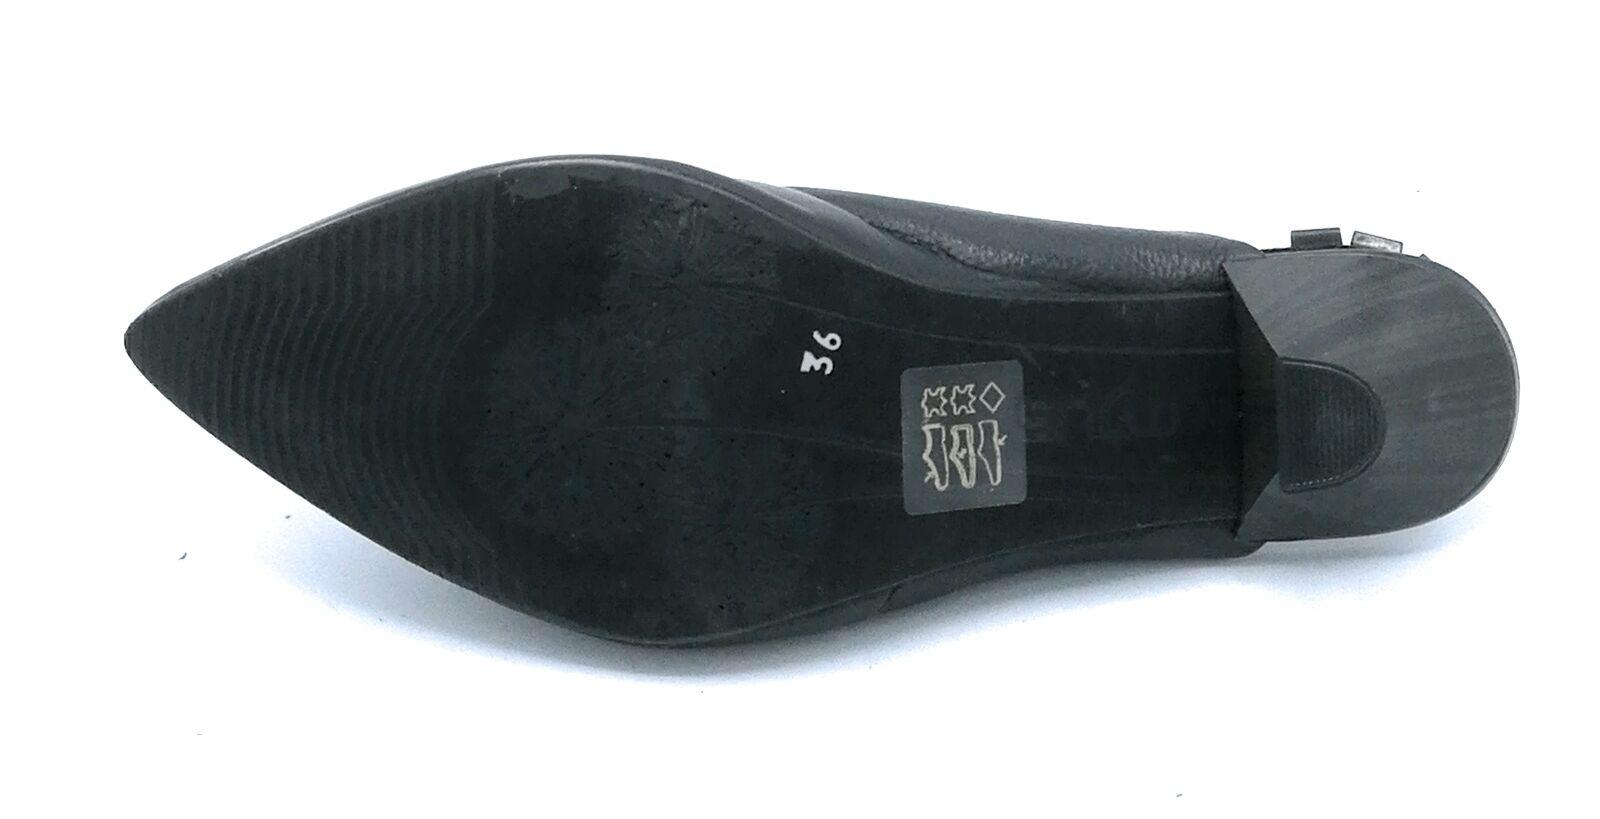 Mjus 715110 Holzschuhe Holzschuhe Holzschuhe Quaste Schwarz Fersenriemen 4 CM c7db49